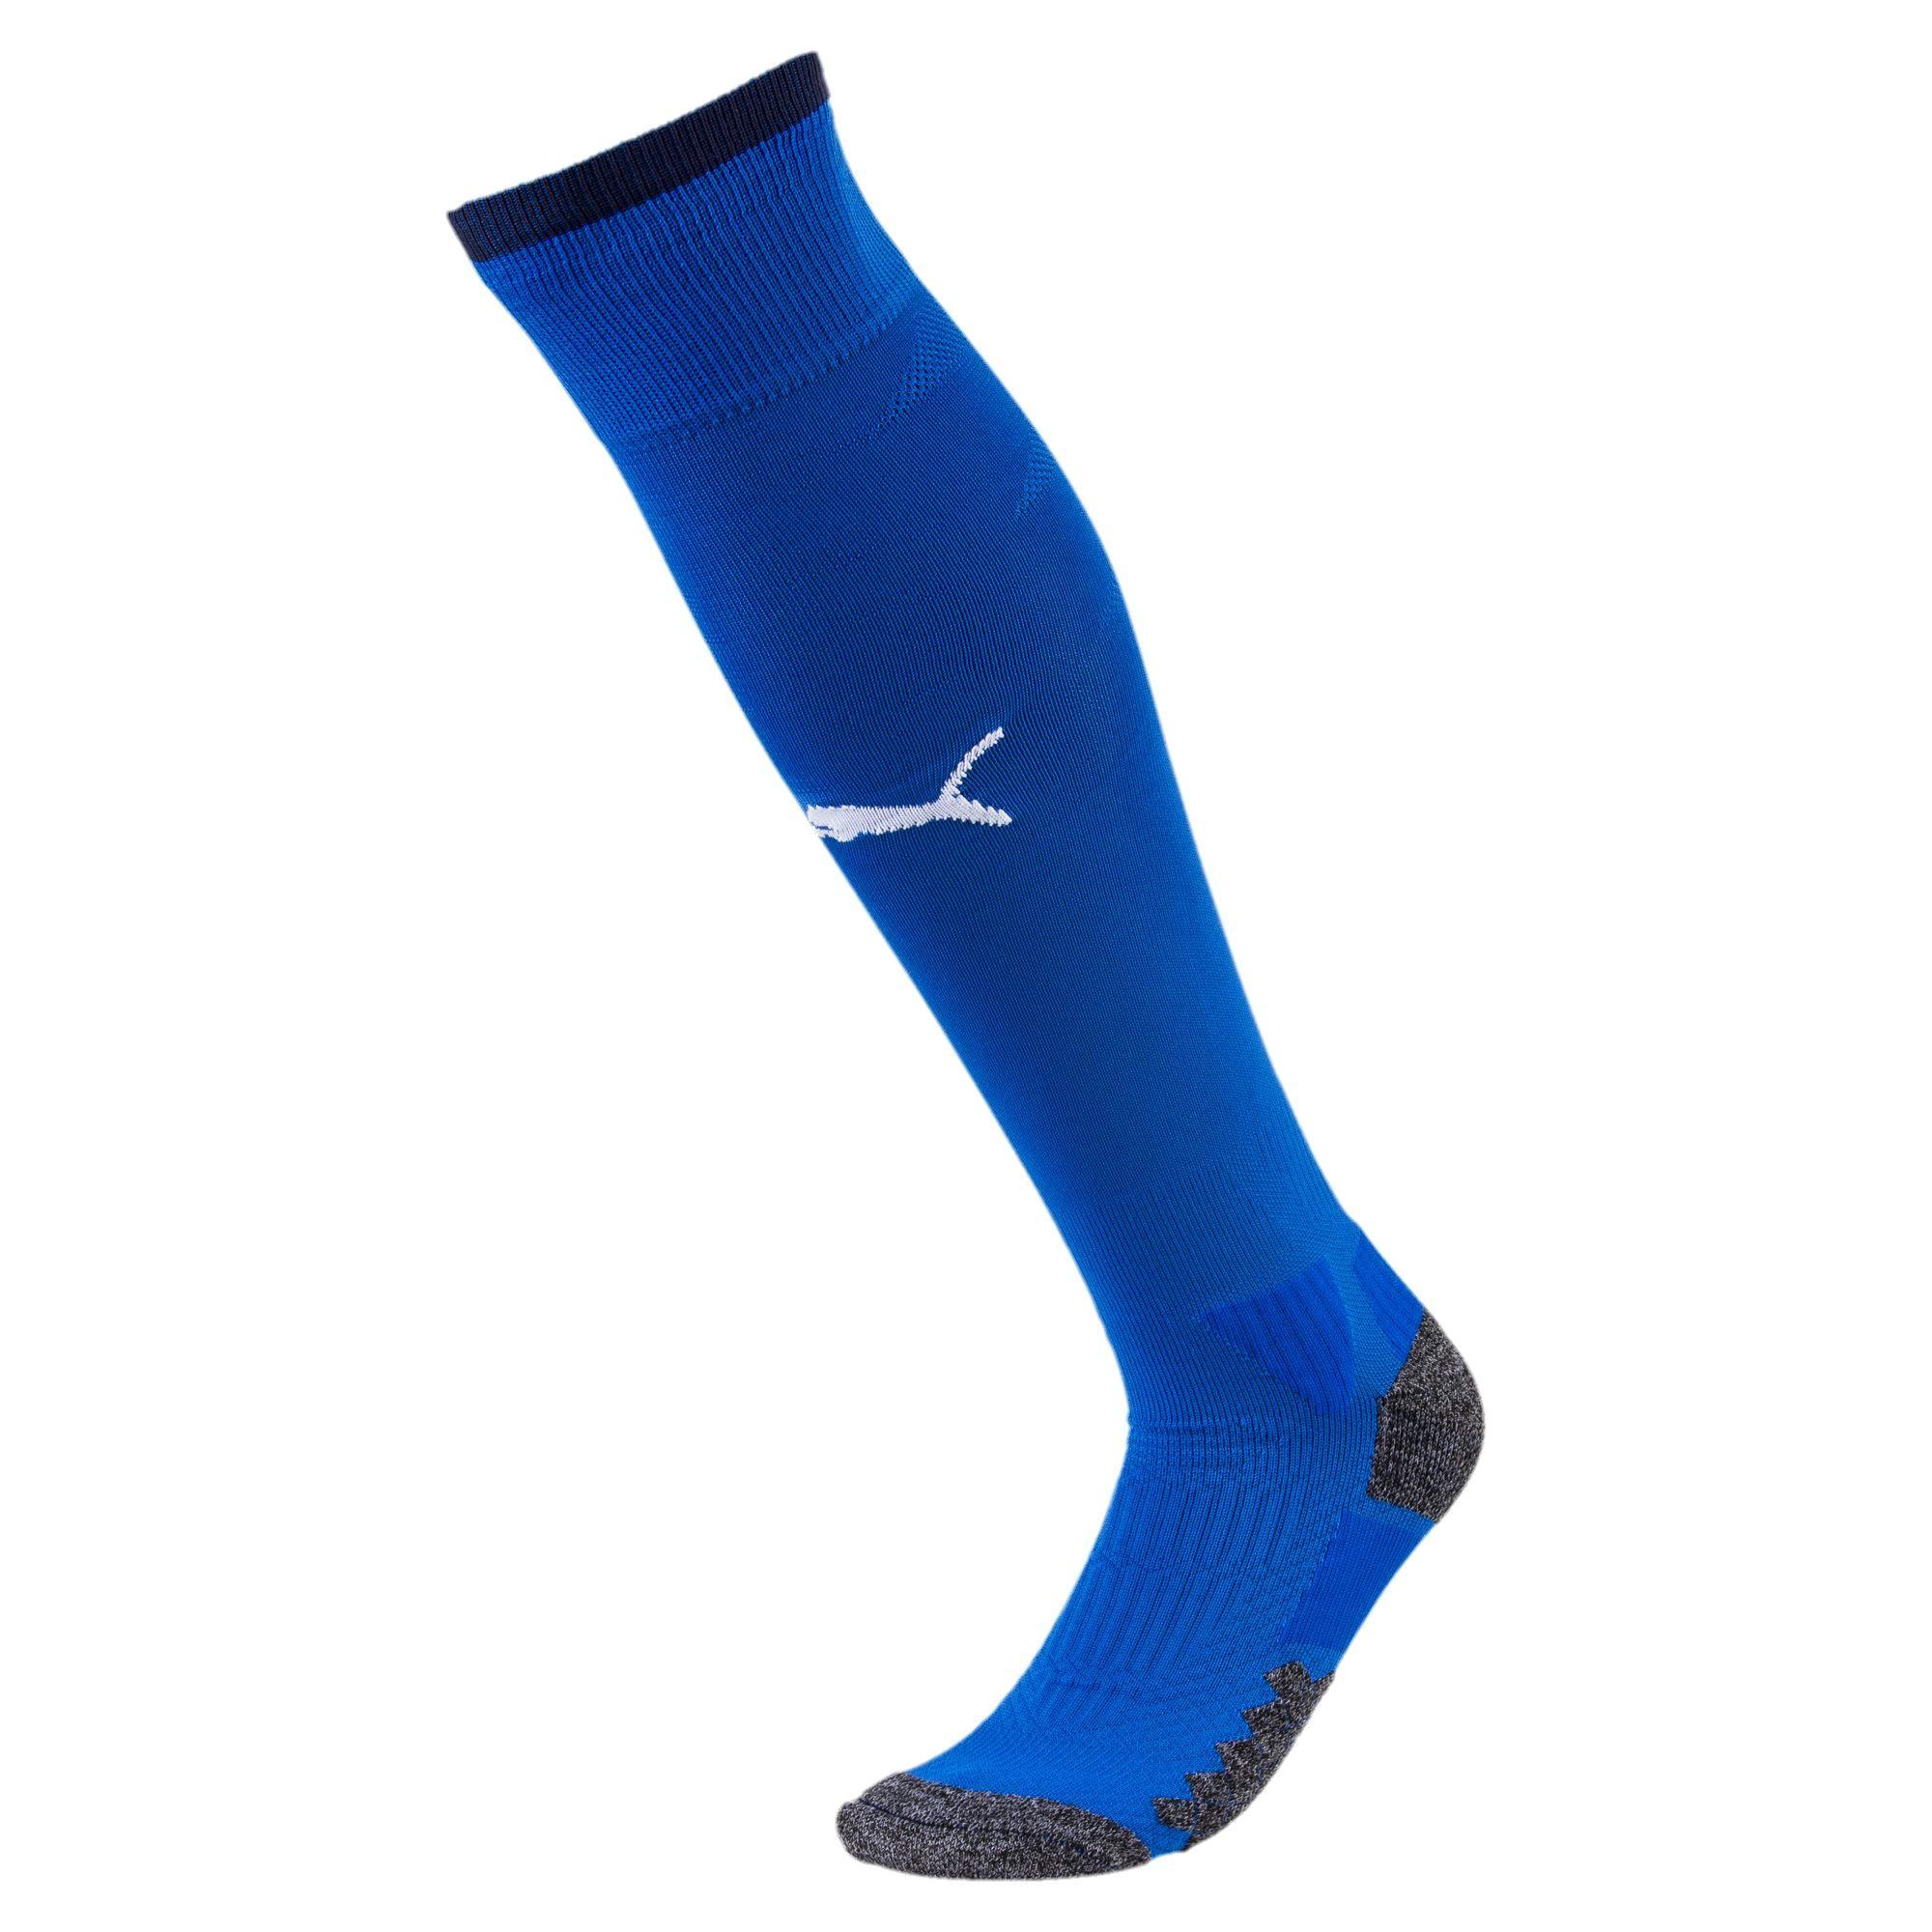 Figc Italia Separate Socks